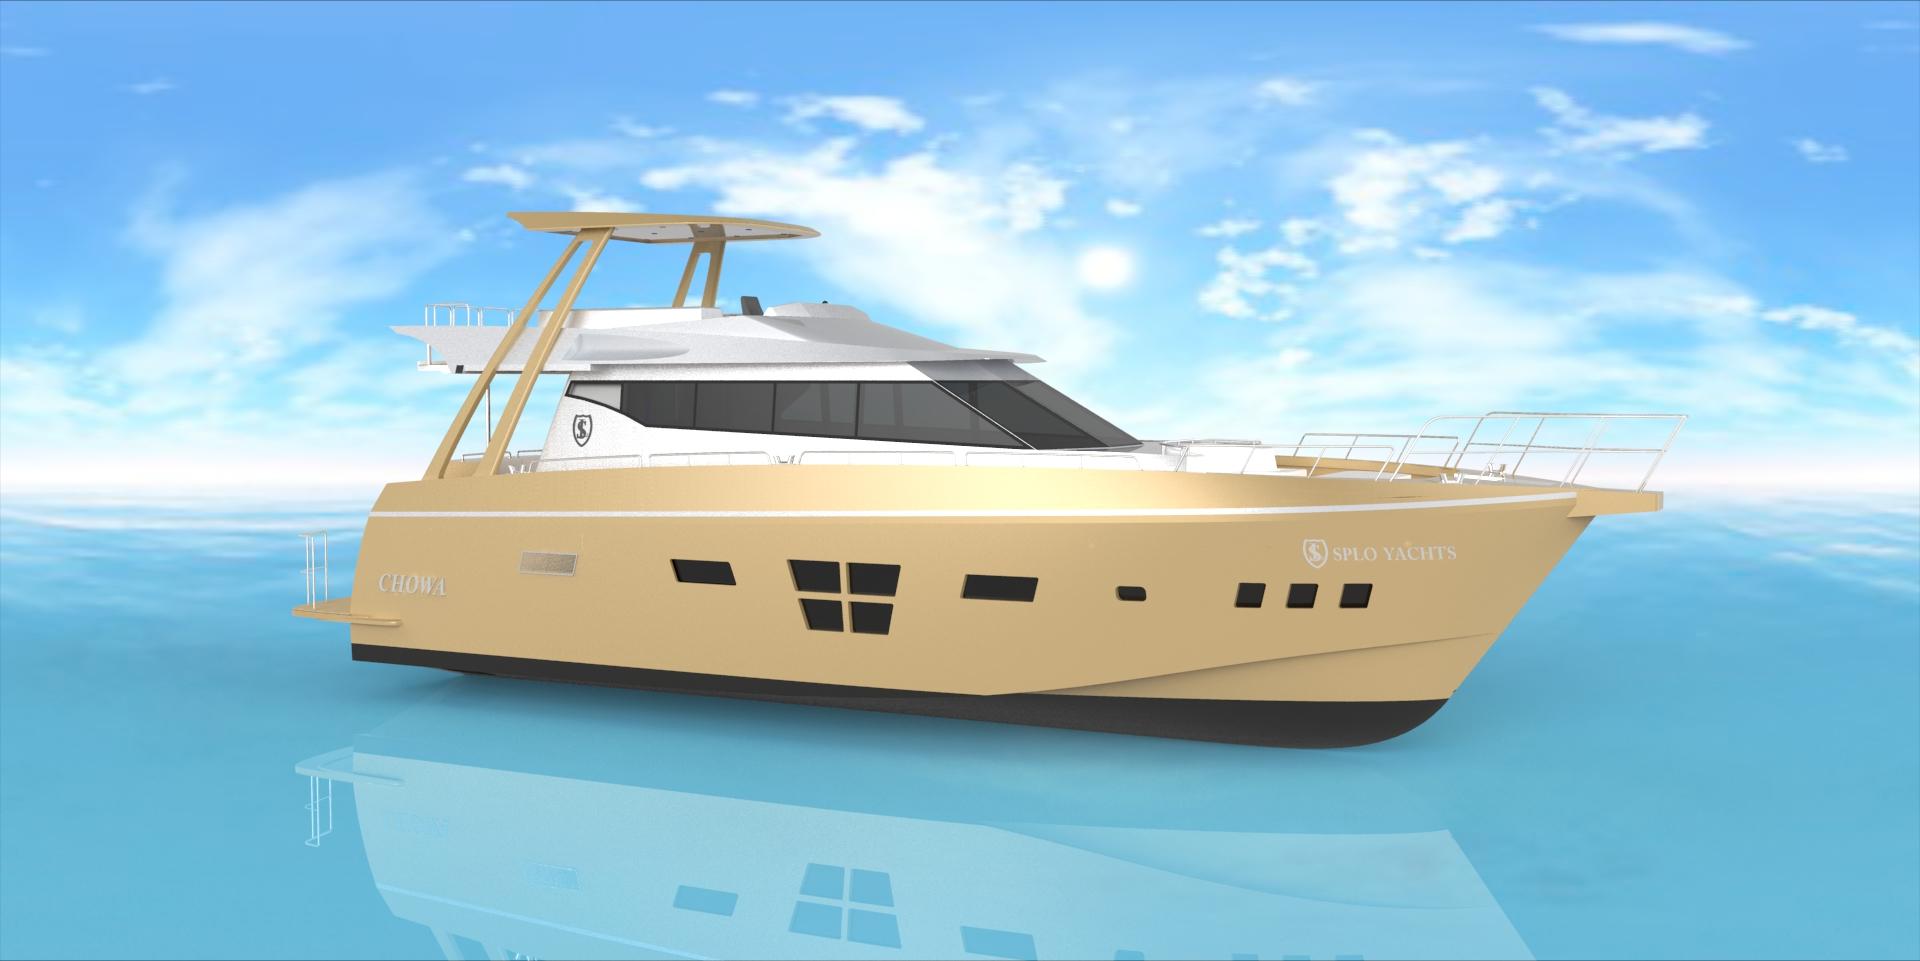 72ft Power boat